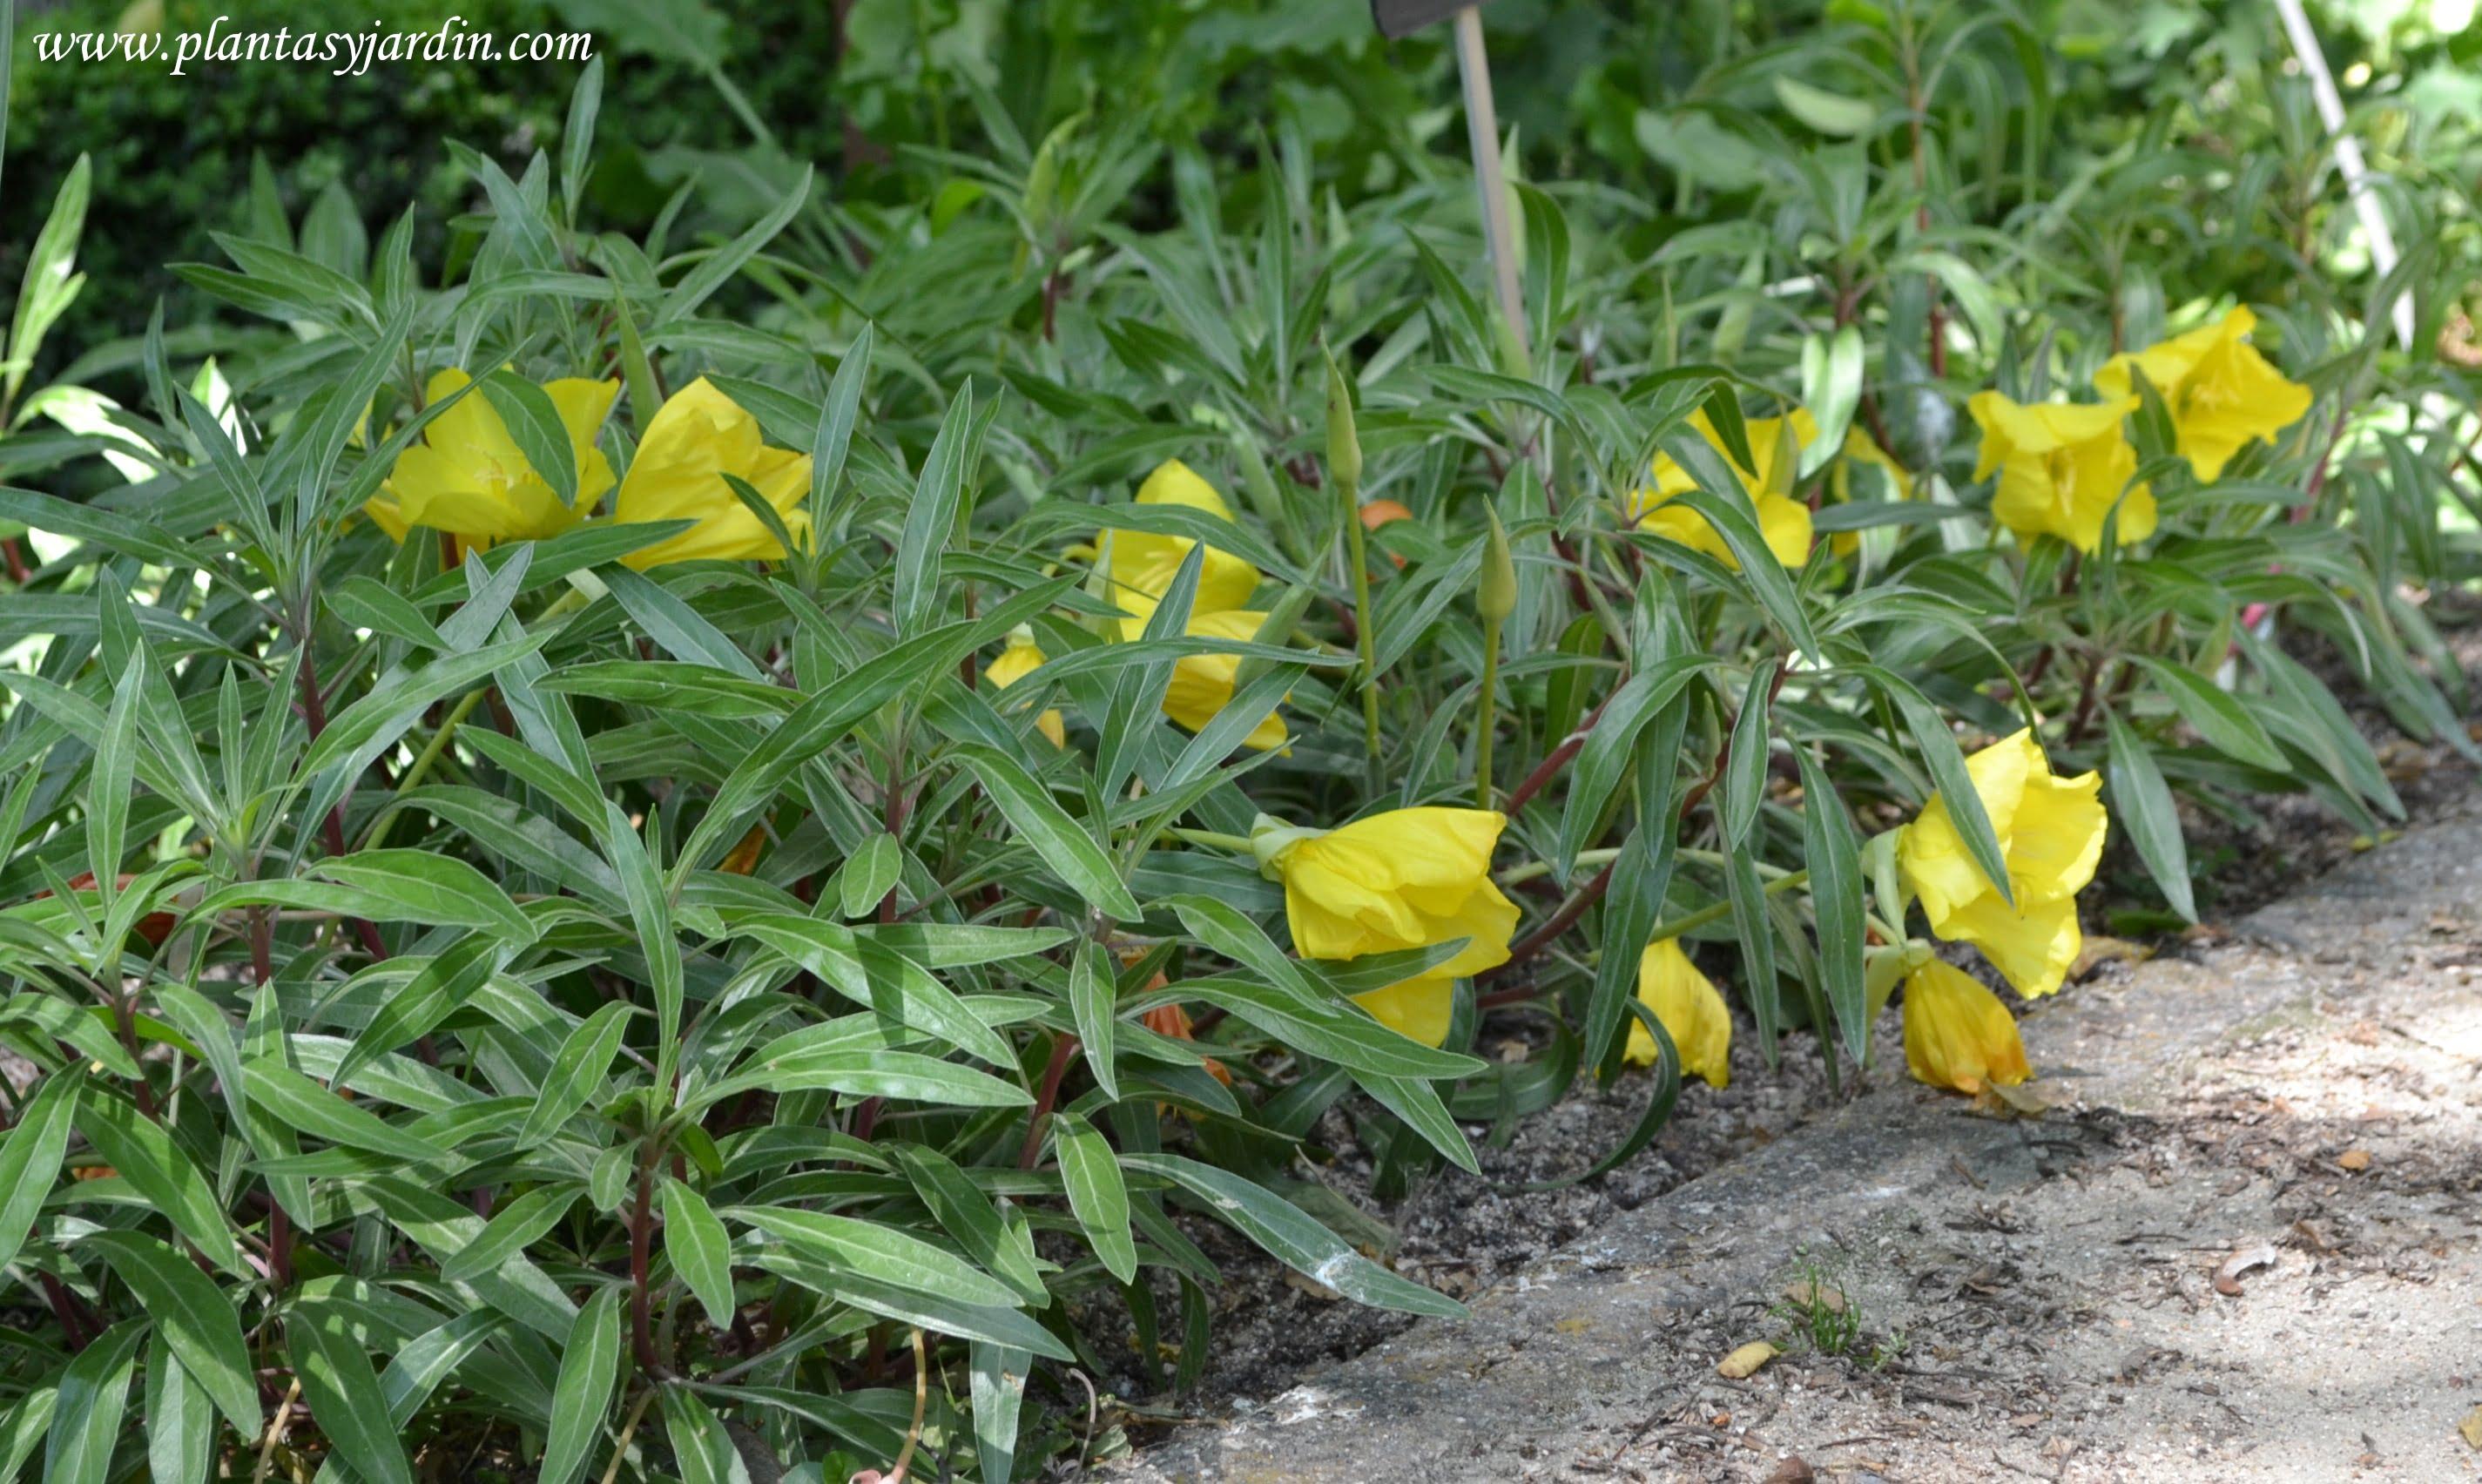 Oenothera missouriensis, florecida en primavera